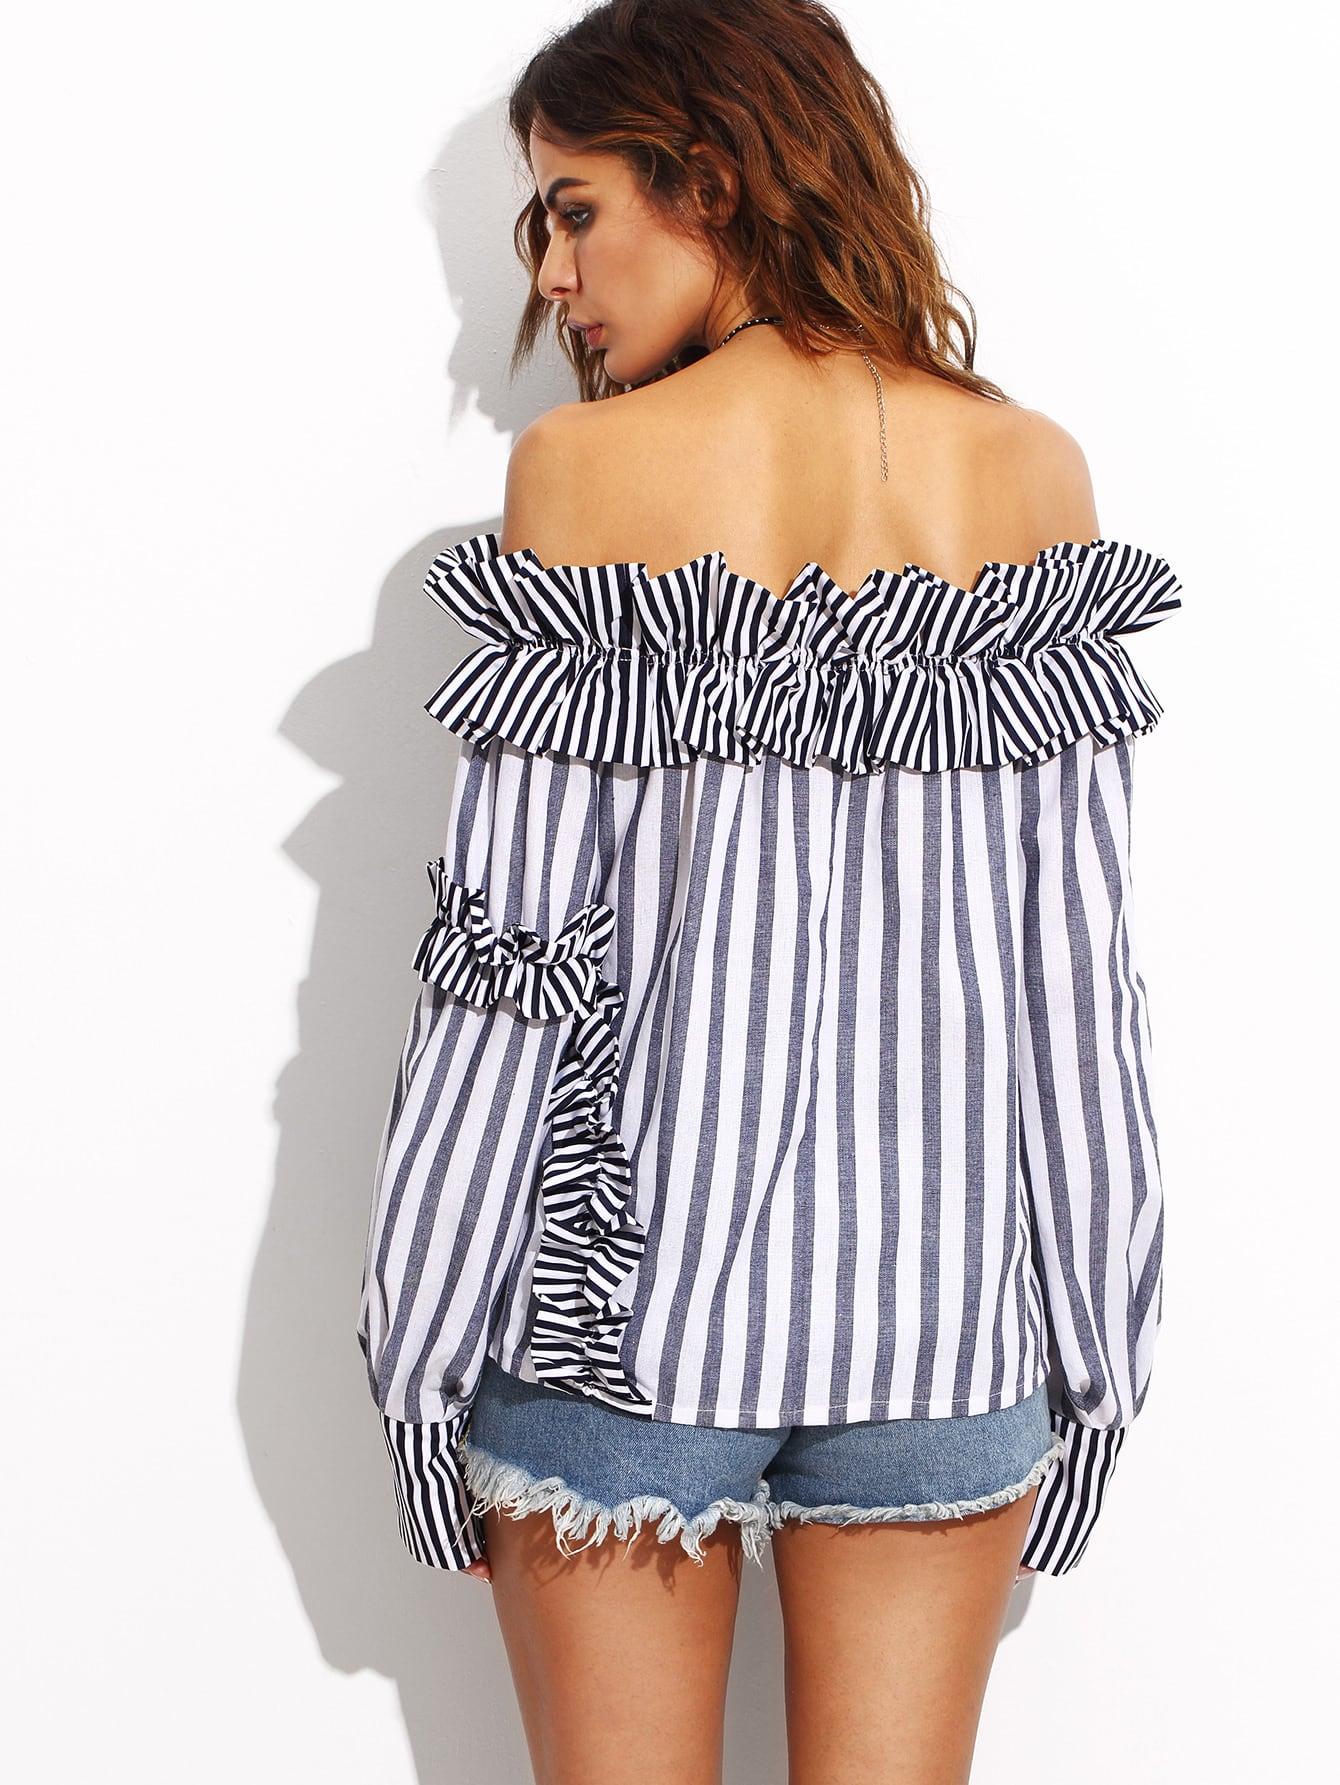 blouse1160816701_2